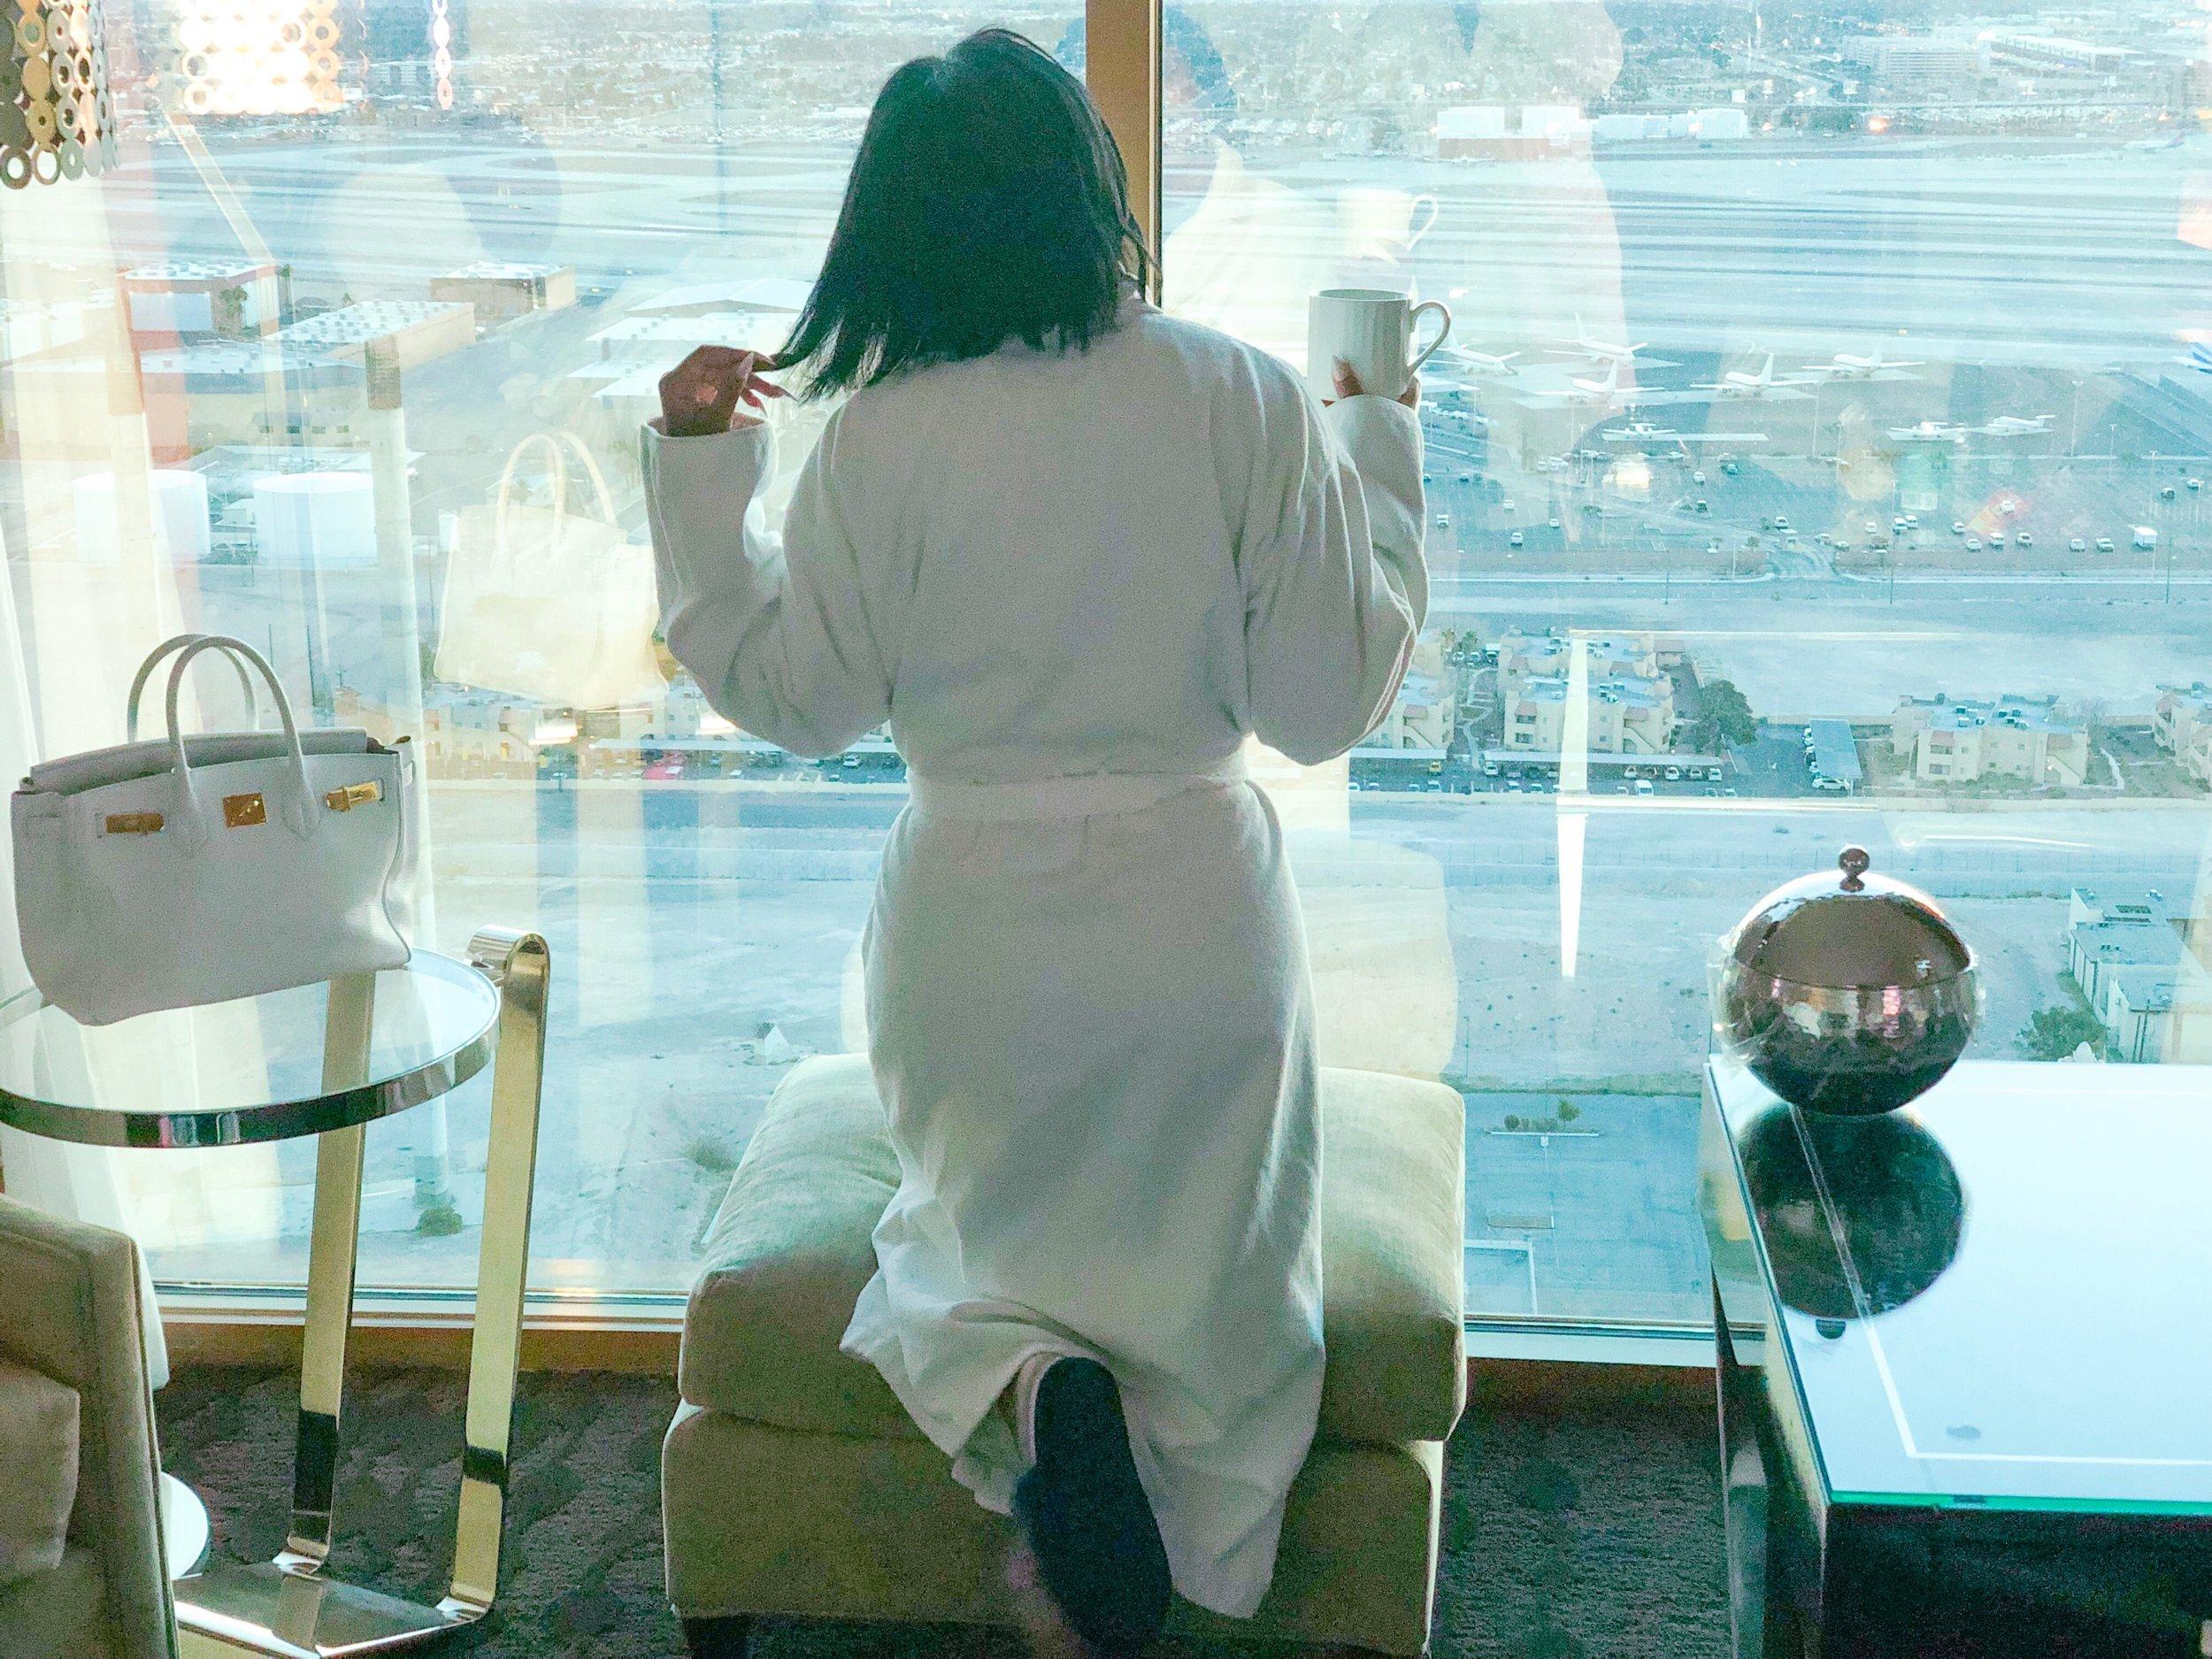 Shaunda enjoying her view of Las Vegas from her room in the Four Seasons Hotel Las Vegas.